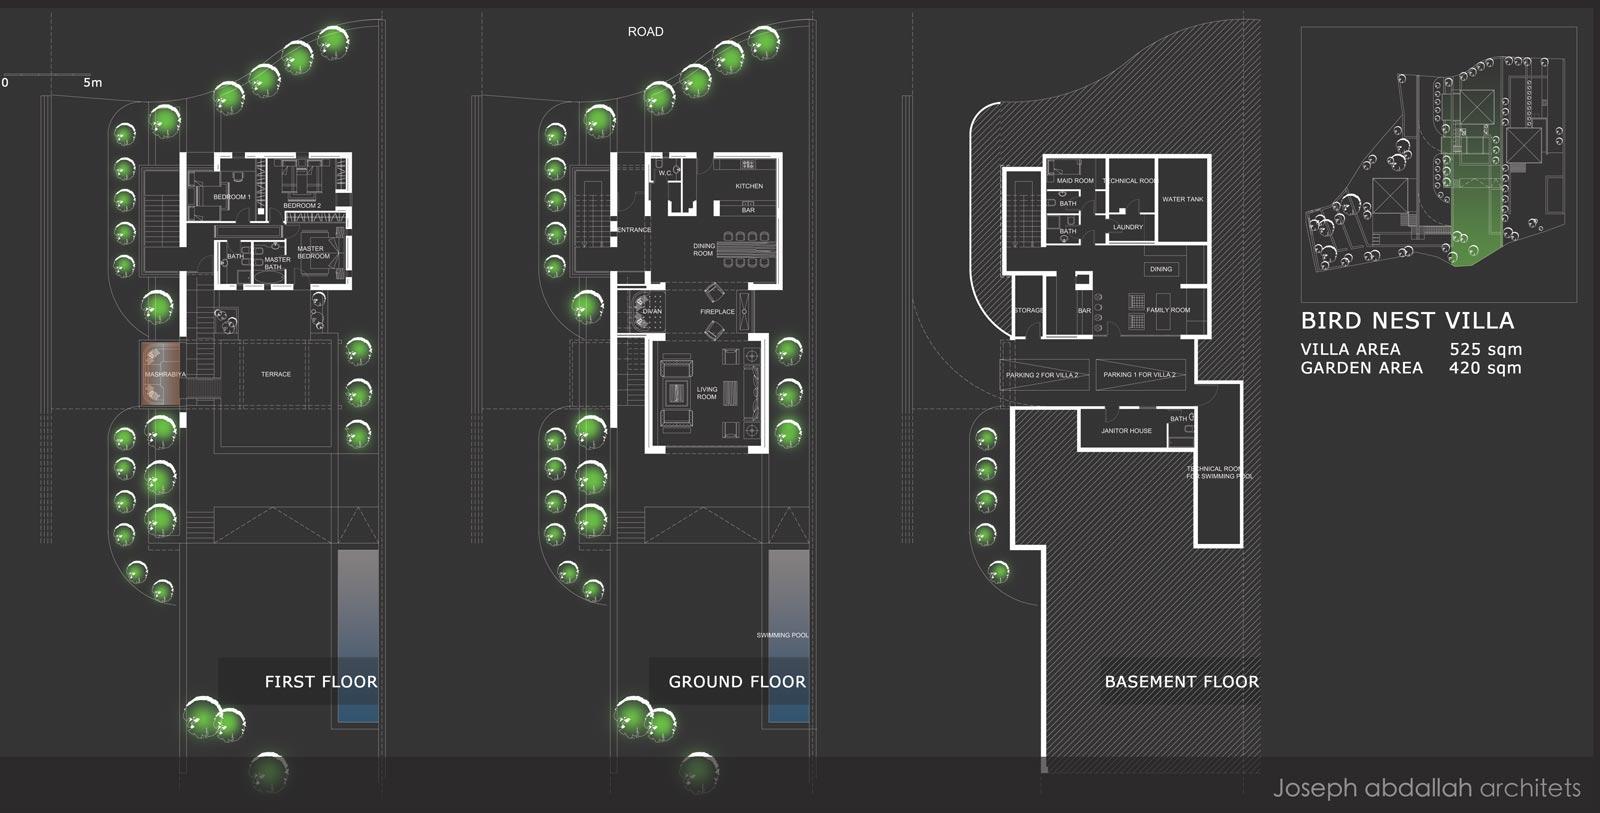 domaine-du-chene-lebanese-traditional-achitecture-joseph-abdallah-architects-villa2p